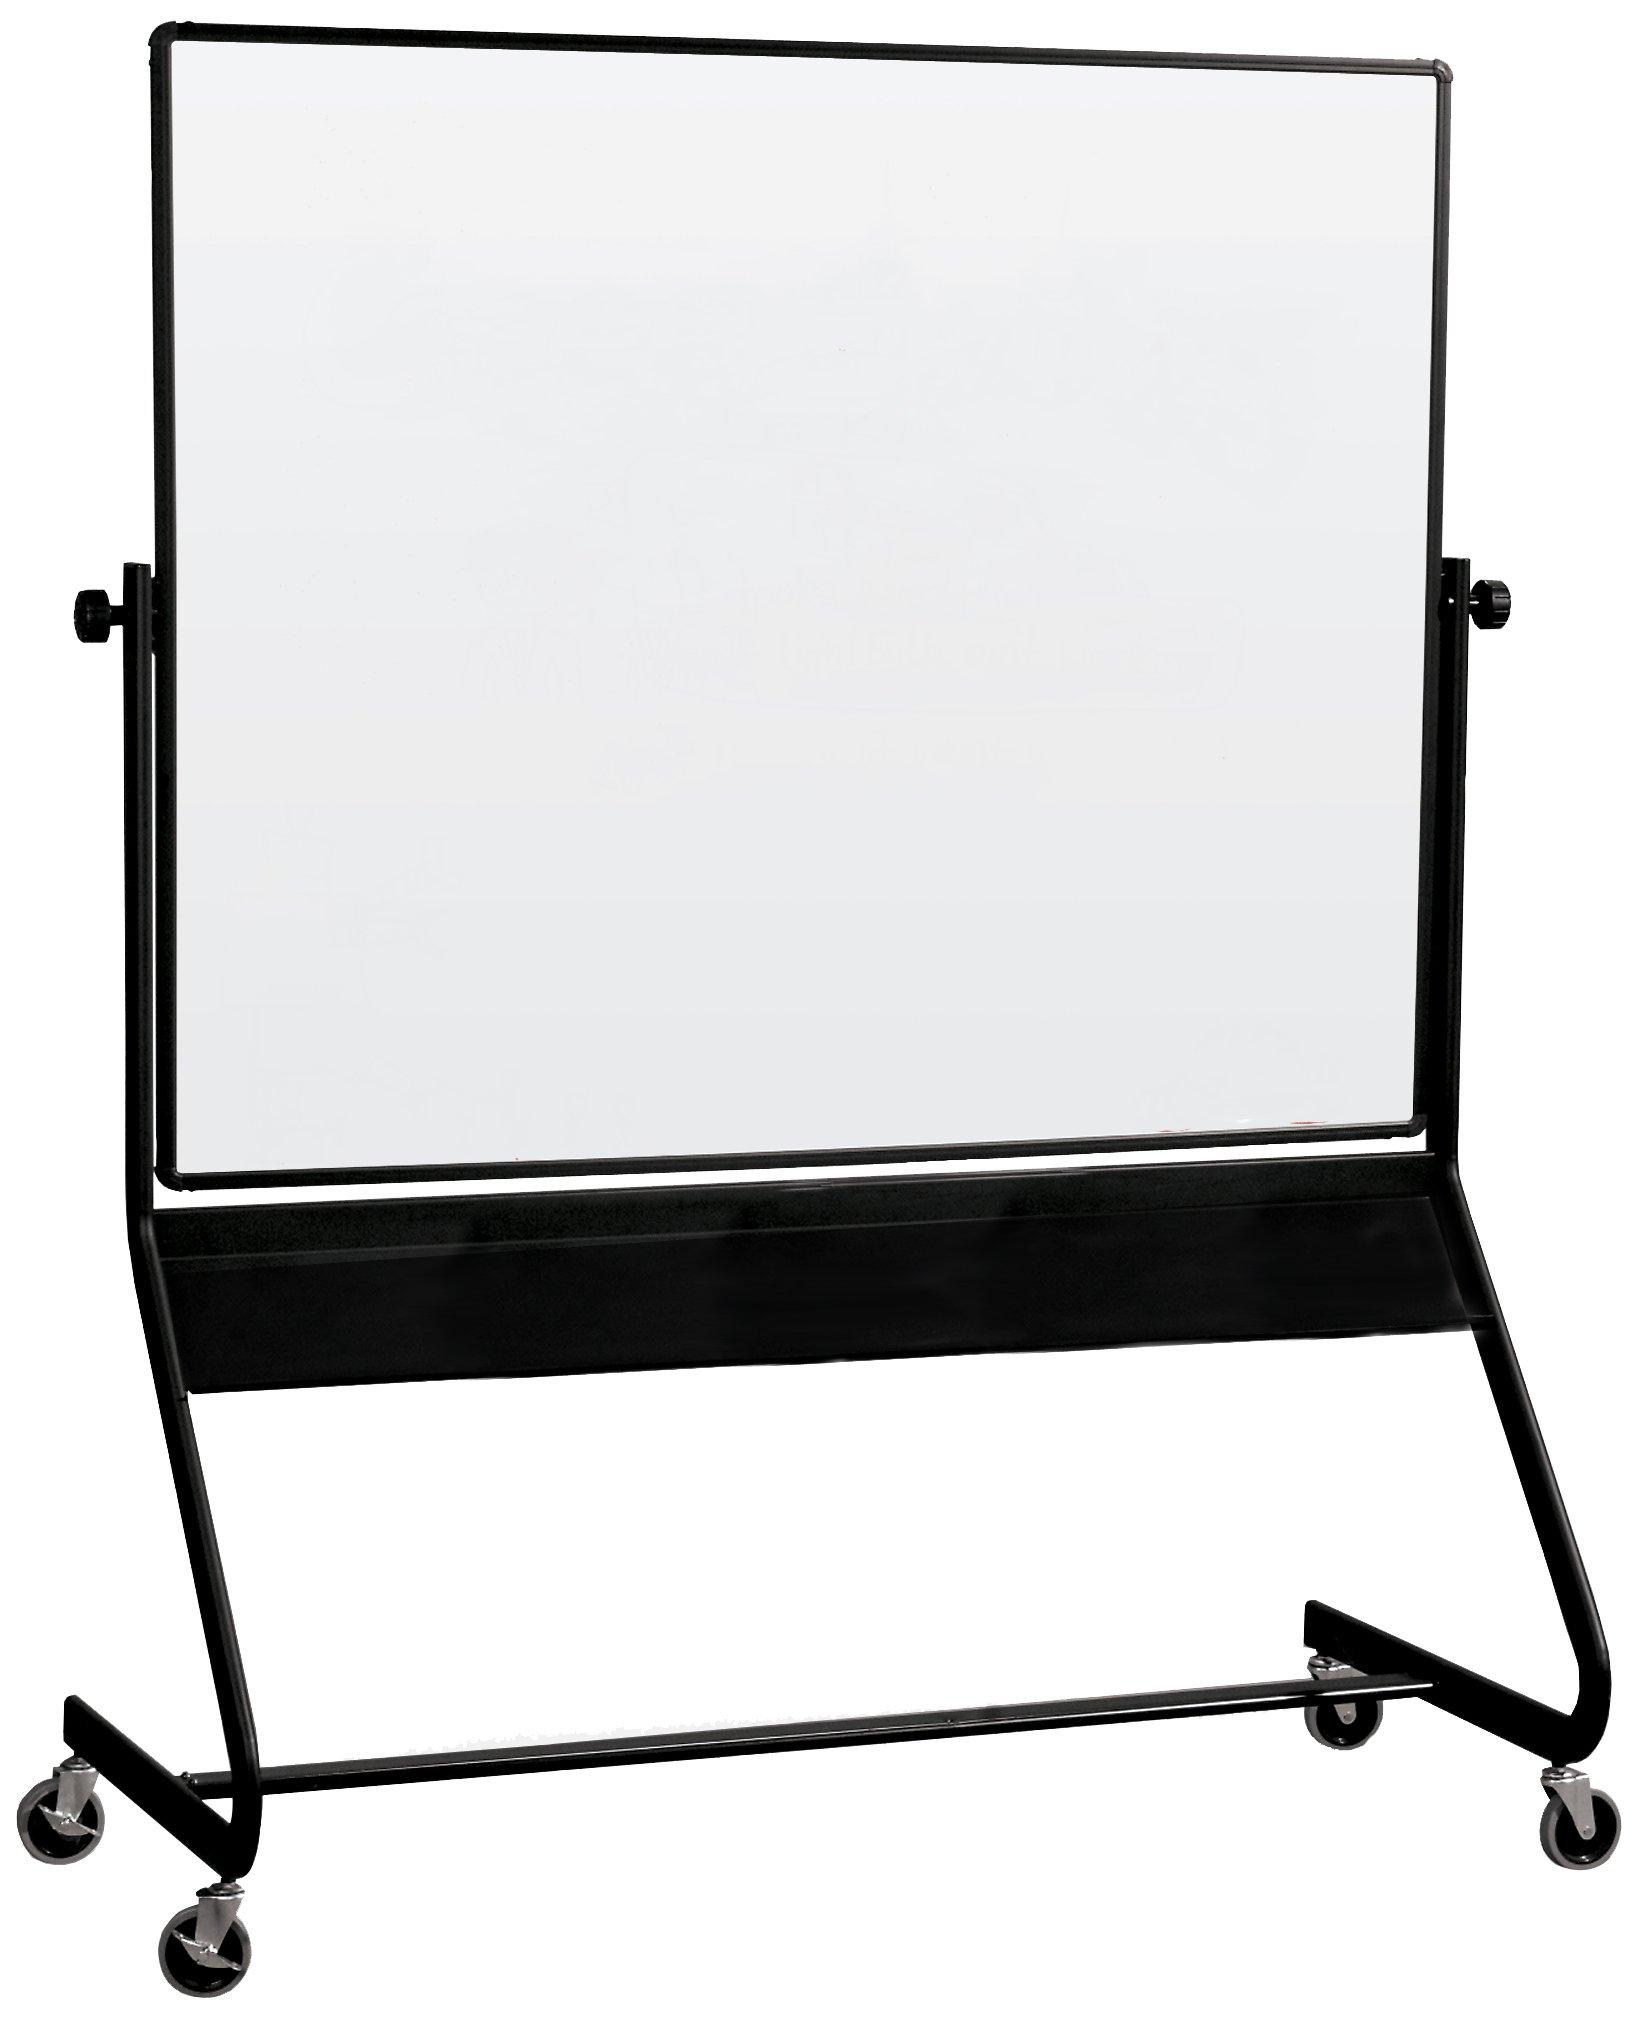 Best-Rite Euro Reversible Mobile Whiteboard, Porcelain Markerboard Both Sides, Panel Size 4 x 6 Feet (667RG-DD)